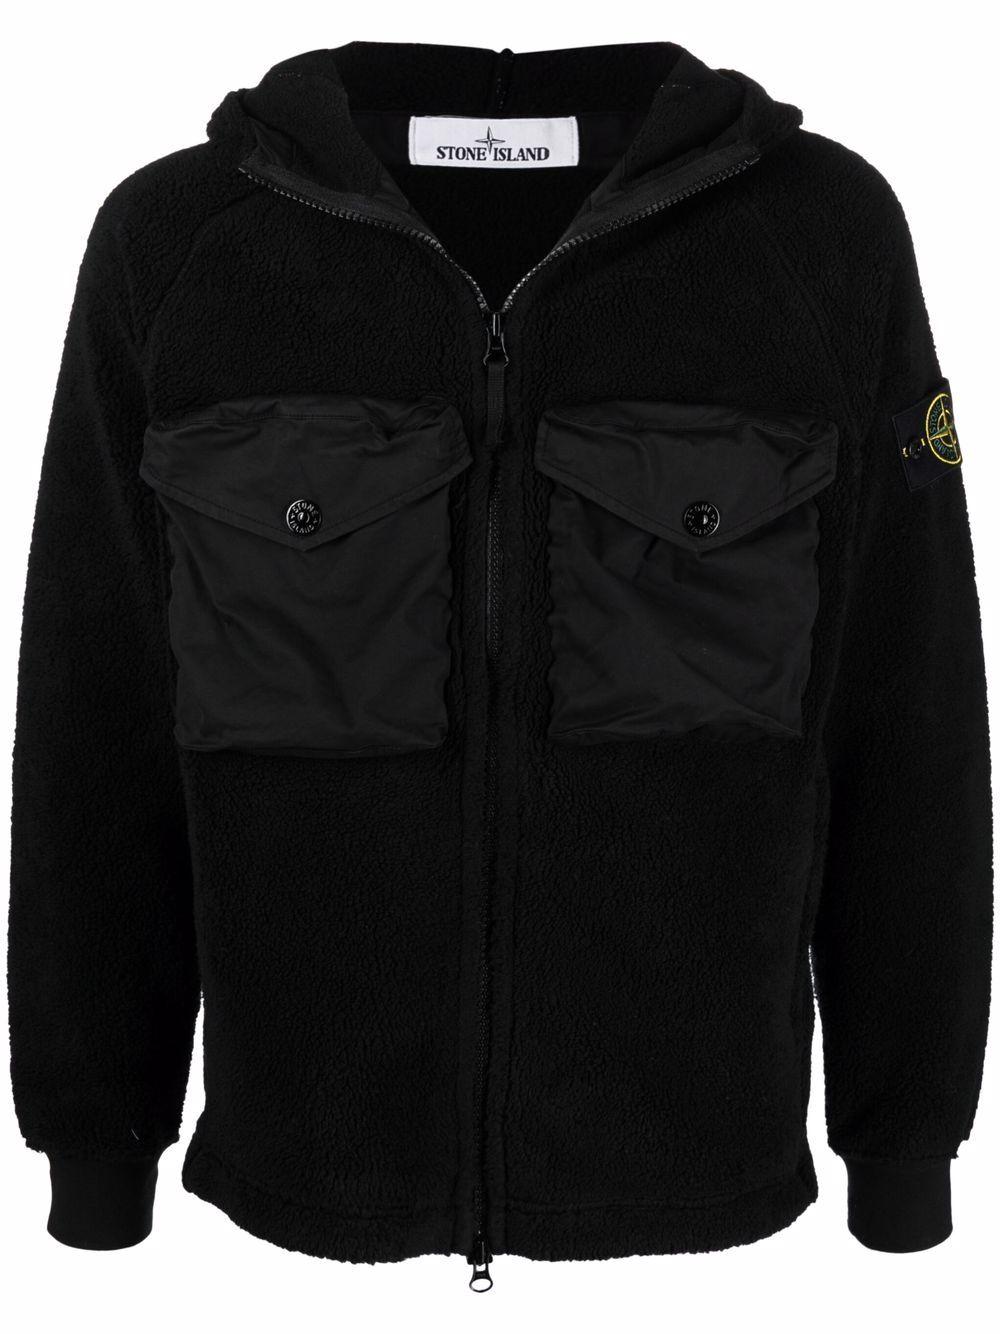 <p class='small-title'>STONE ISLAND</p>Fleece Jacket